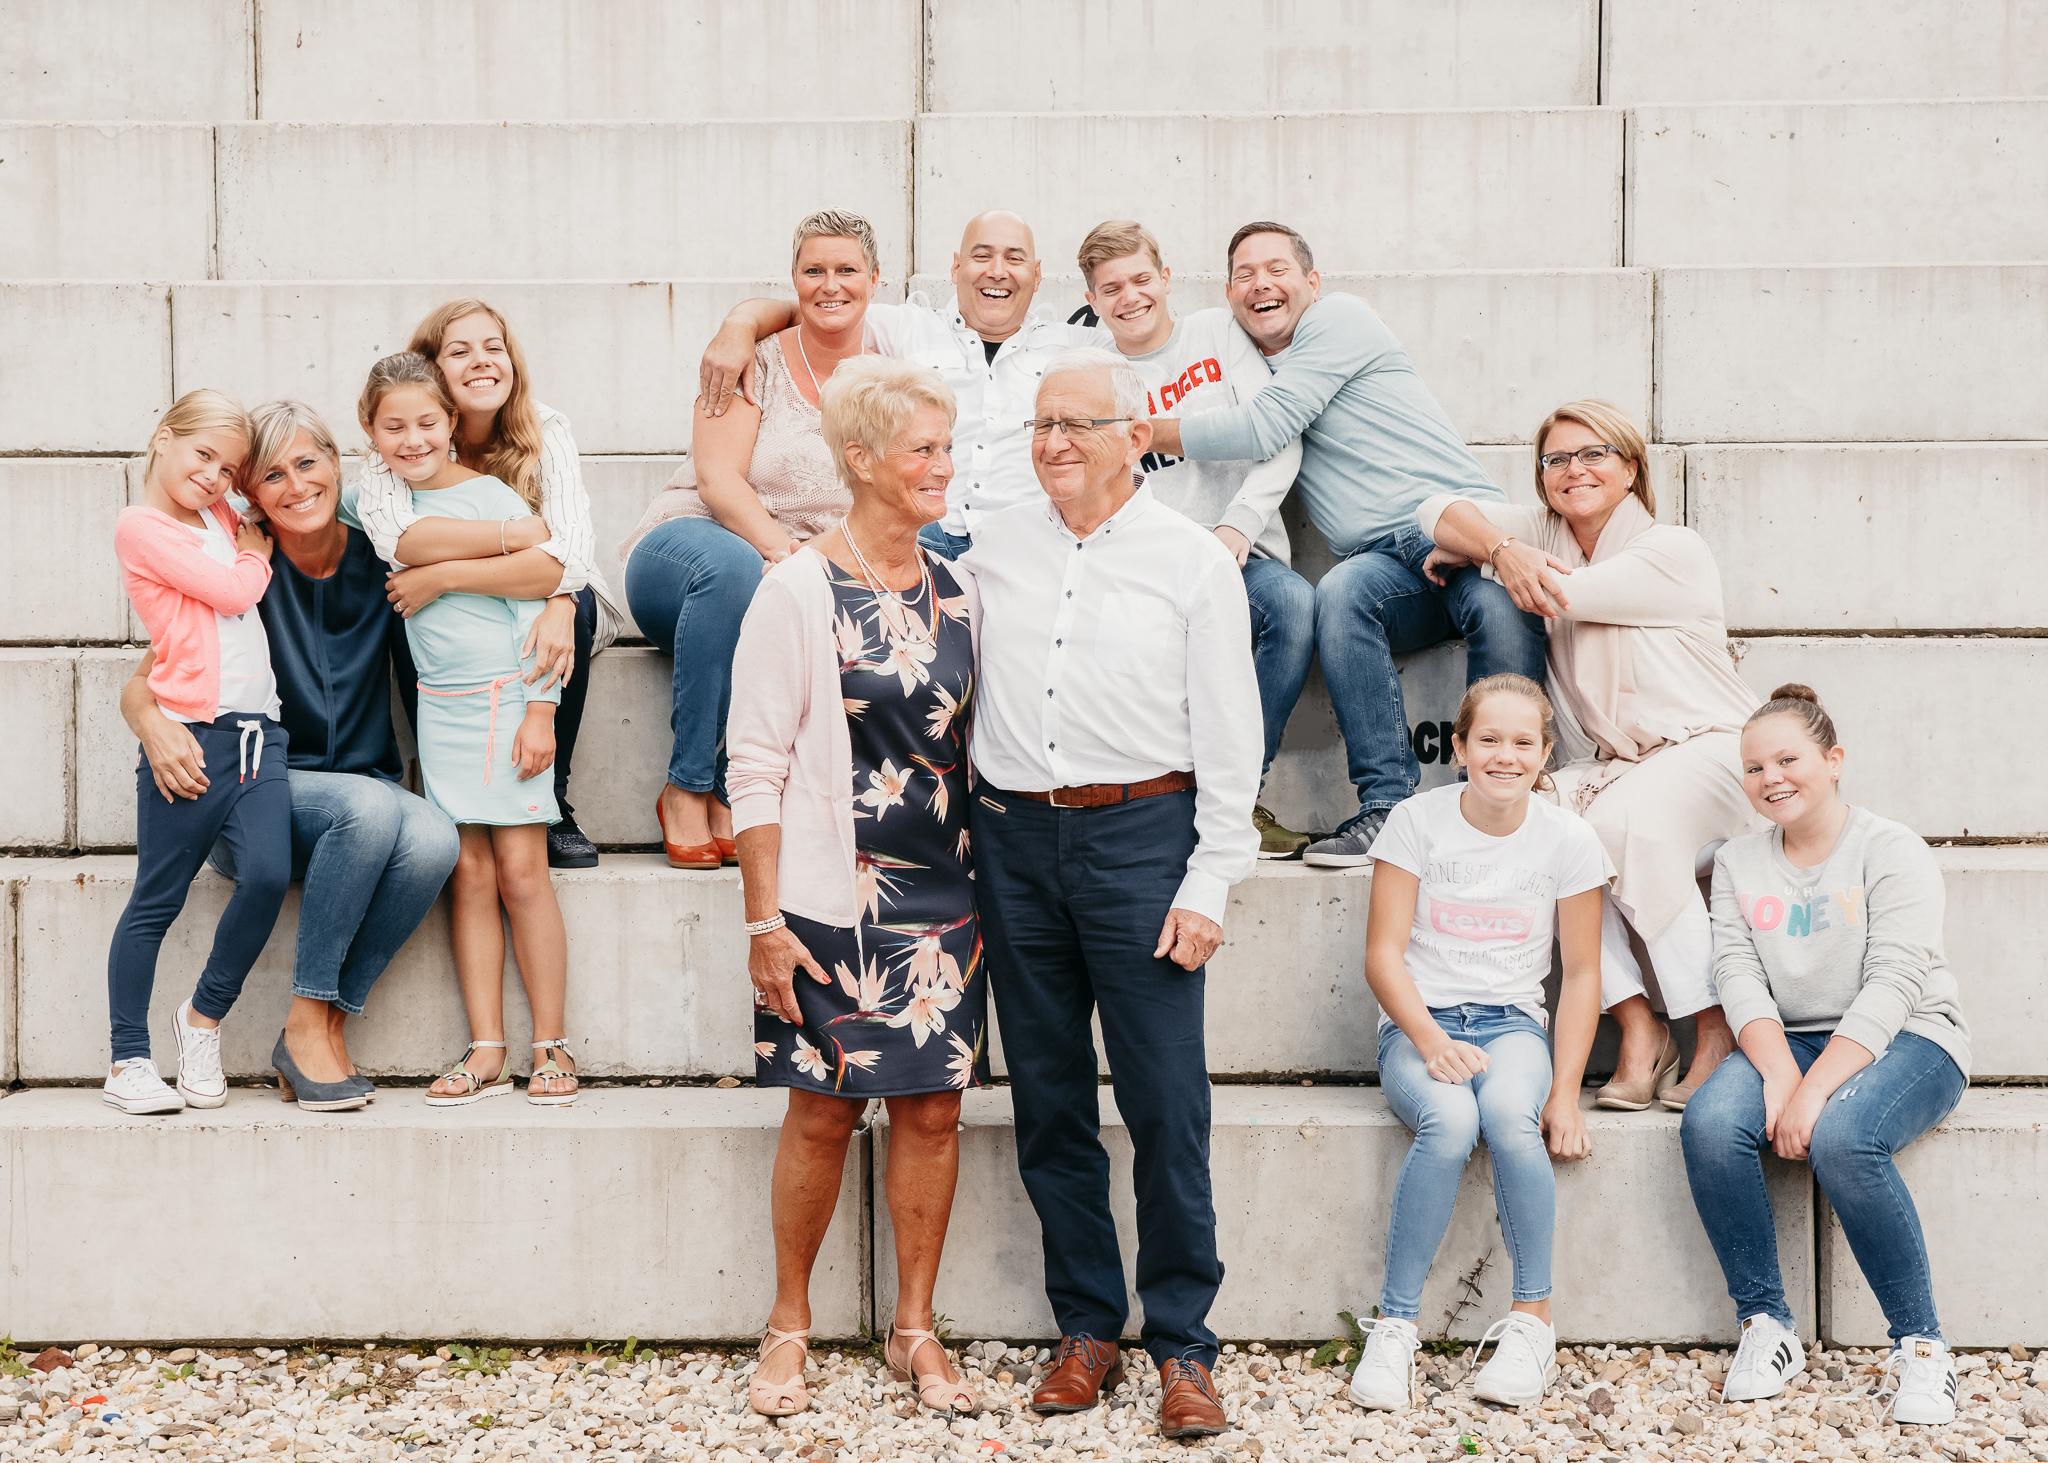 familiereportage fotoshoot familiefotoshoot kim vos fotografie nuenen strijp s Eindhoven